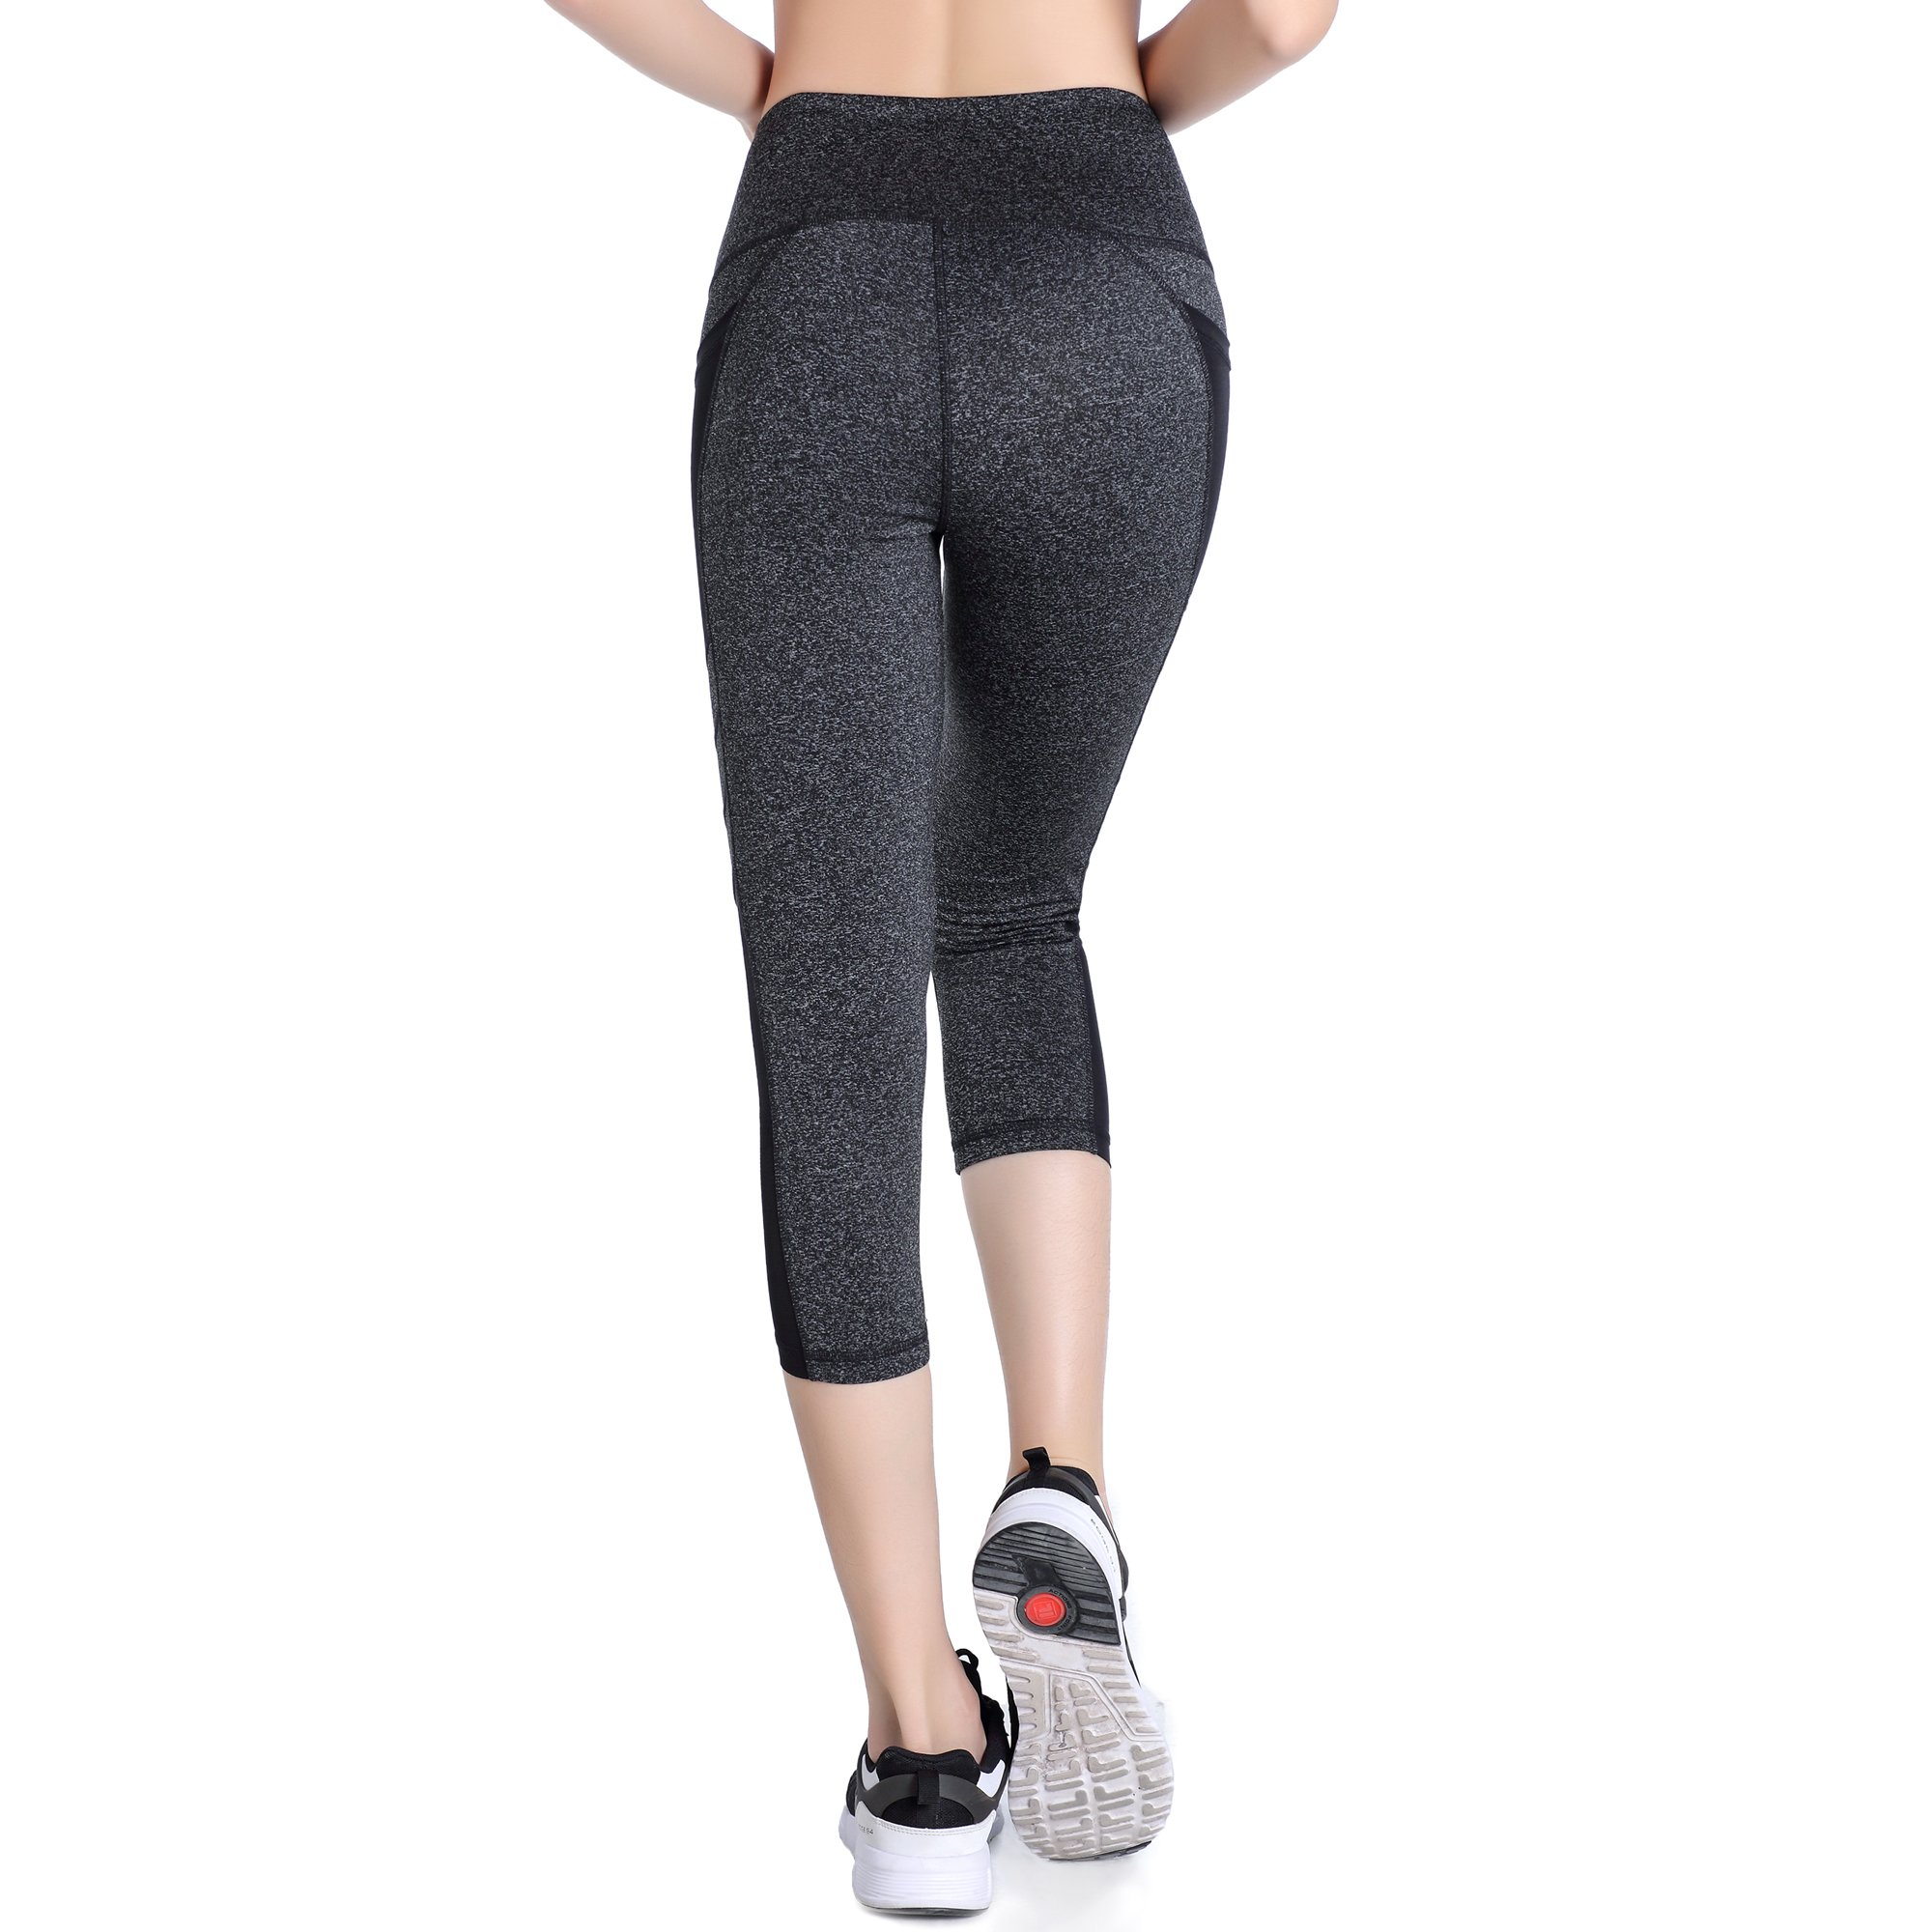 Picotee Women\'s Yoga Capri Pants Workout Running Pants Leggings High Waist With Pocket (M, Grey)